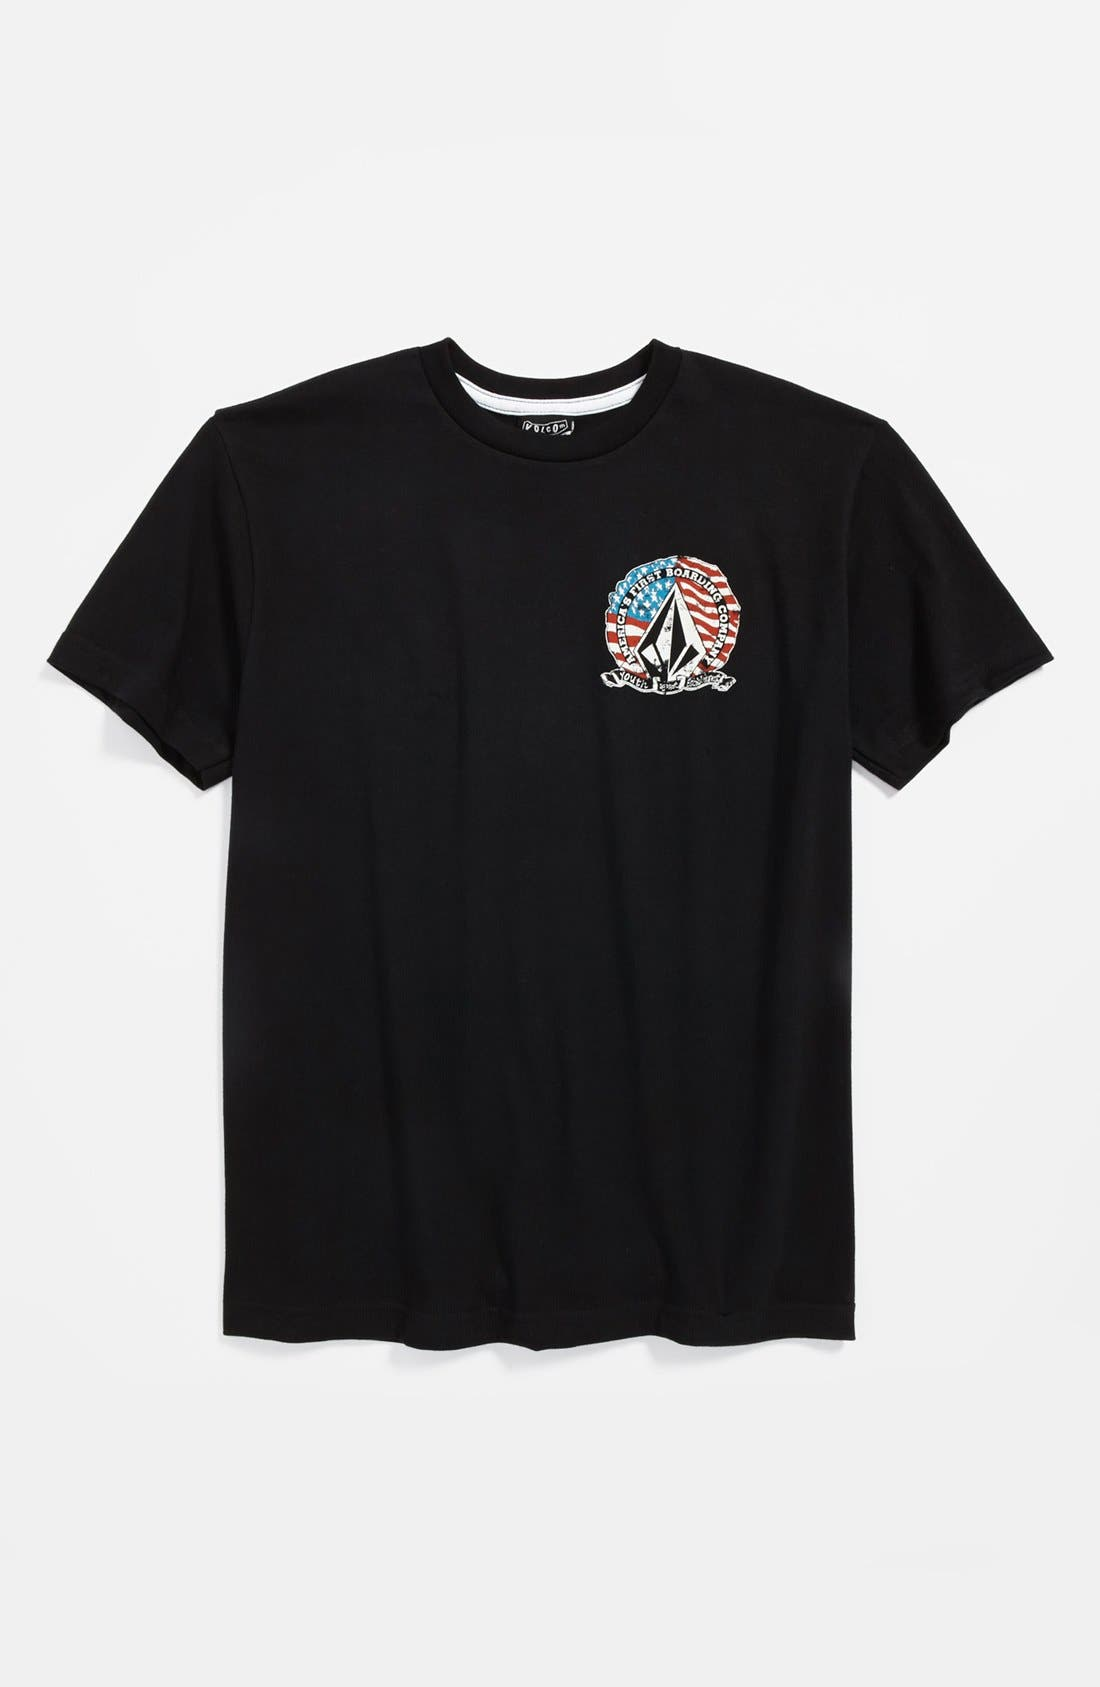 Alternate Image 1 Selected - Volcom 'Perfect Onion' T-Shirt (Big Boys)